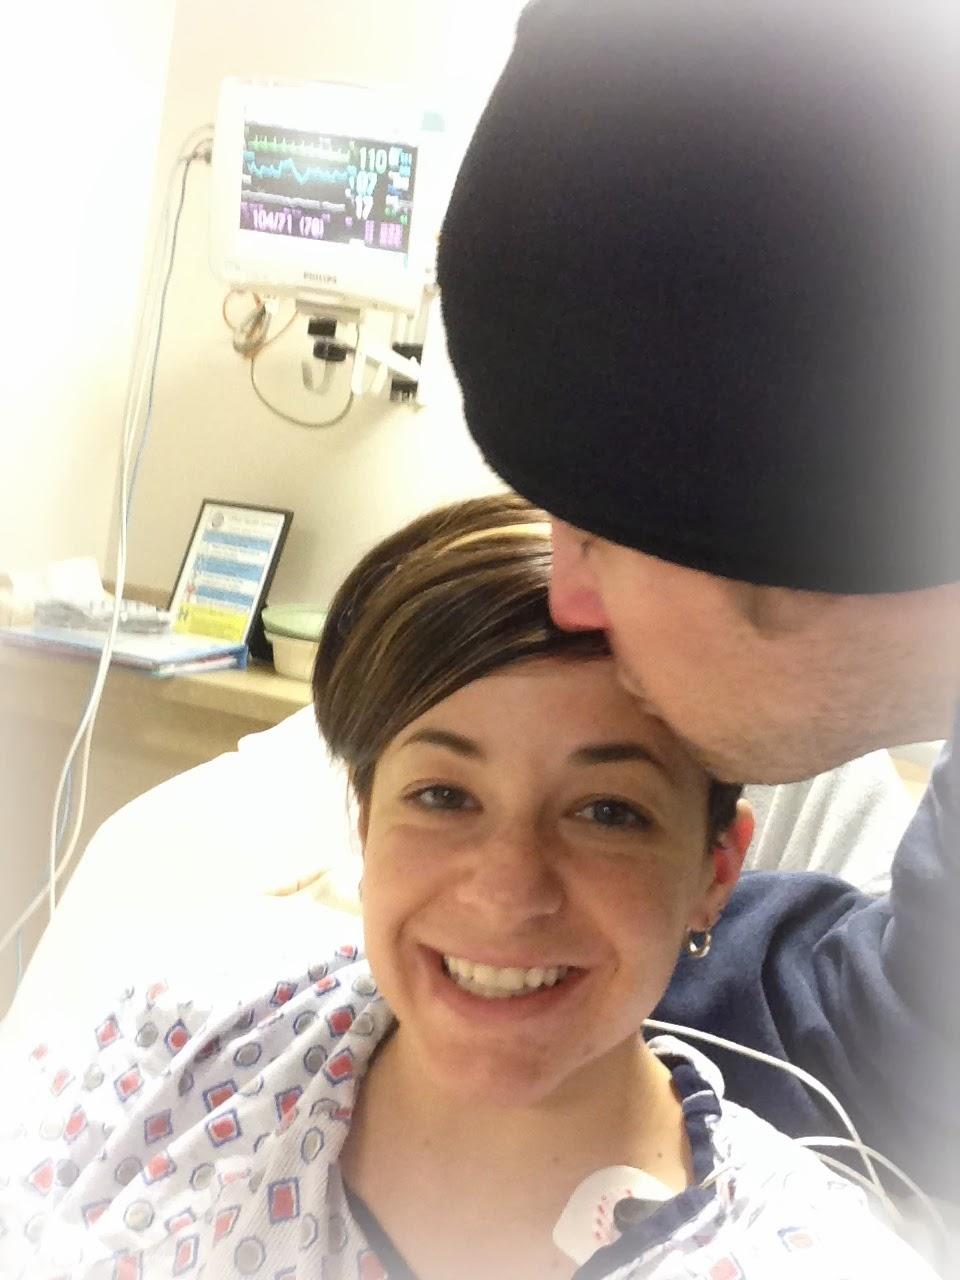 hodgkins lymphoma survivor